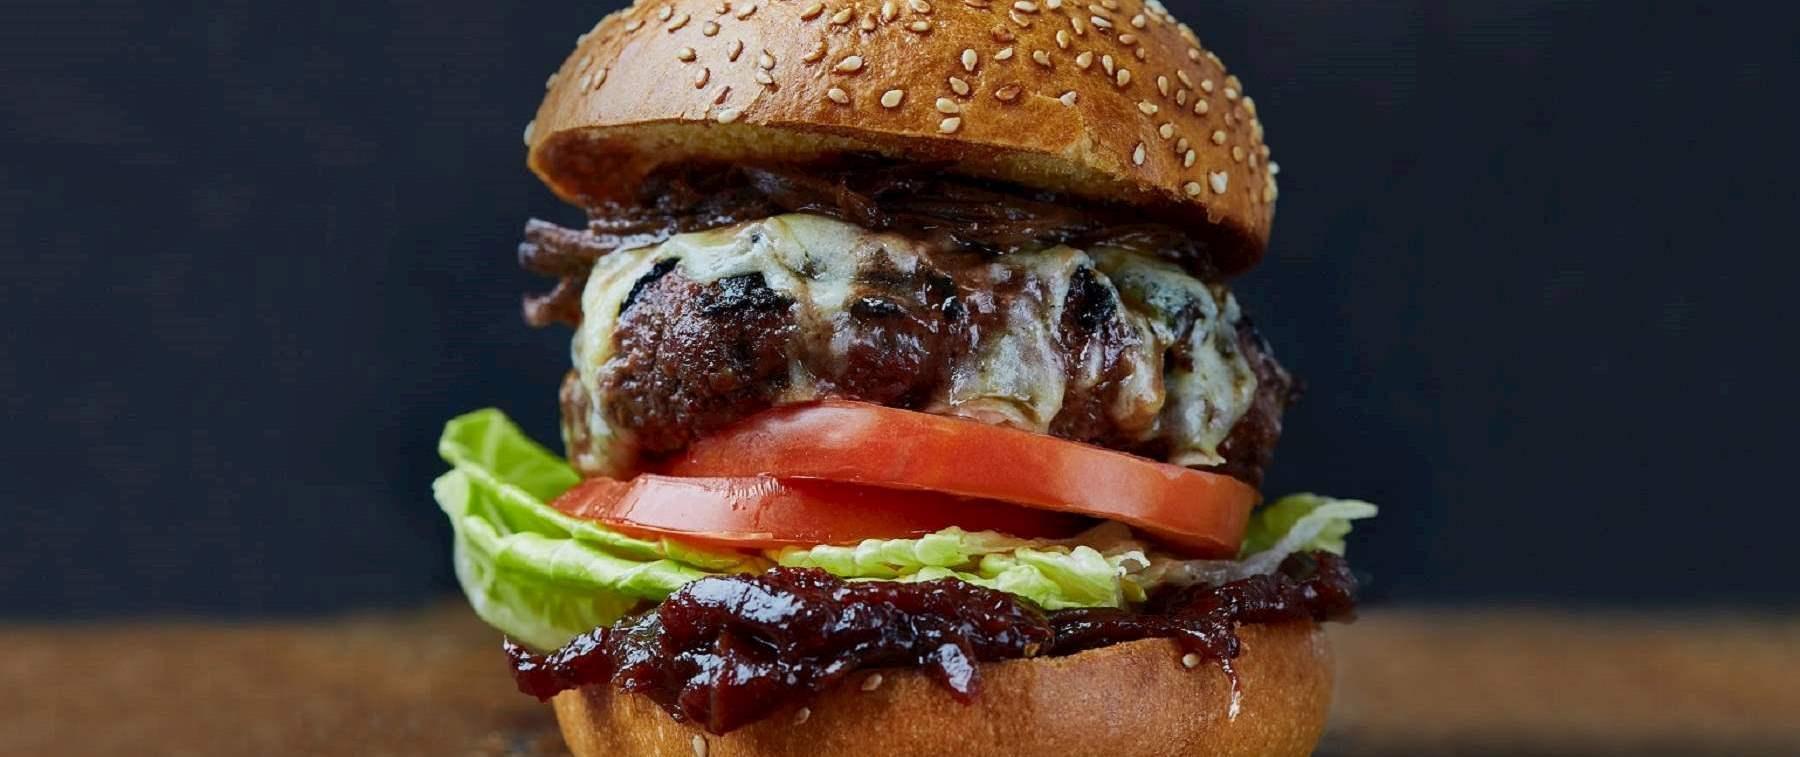 The Pickled Hen Burger